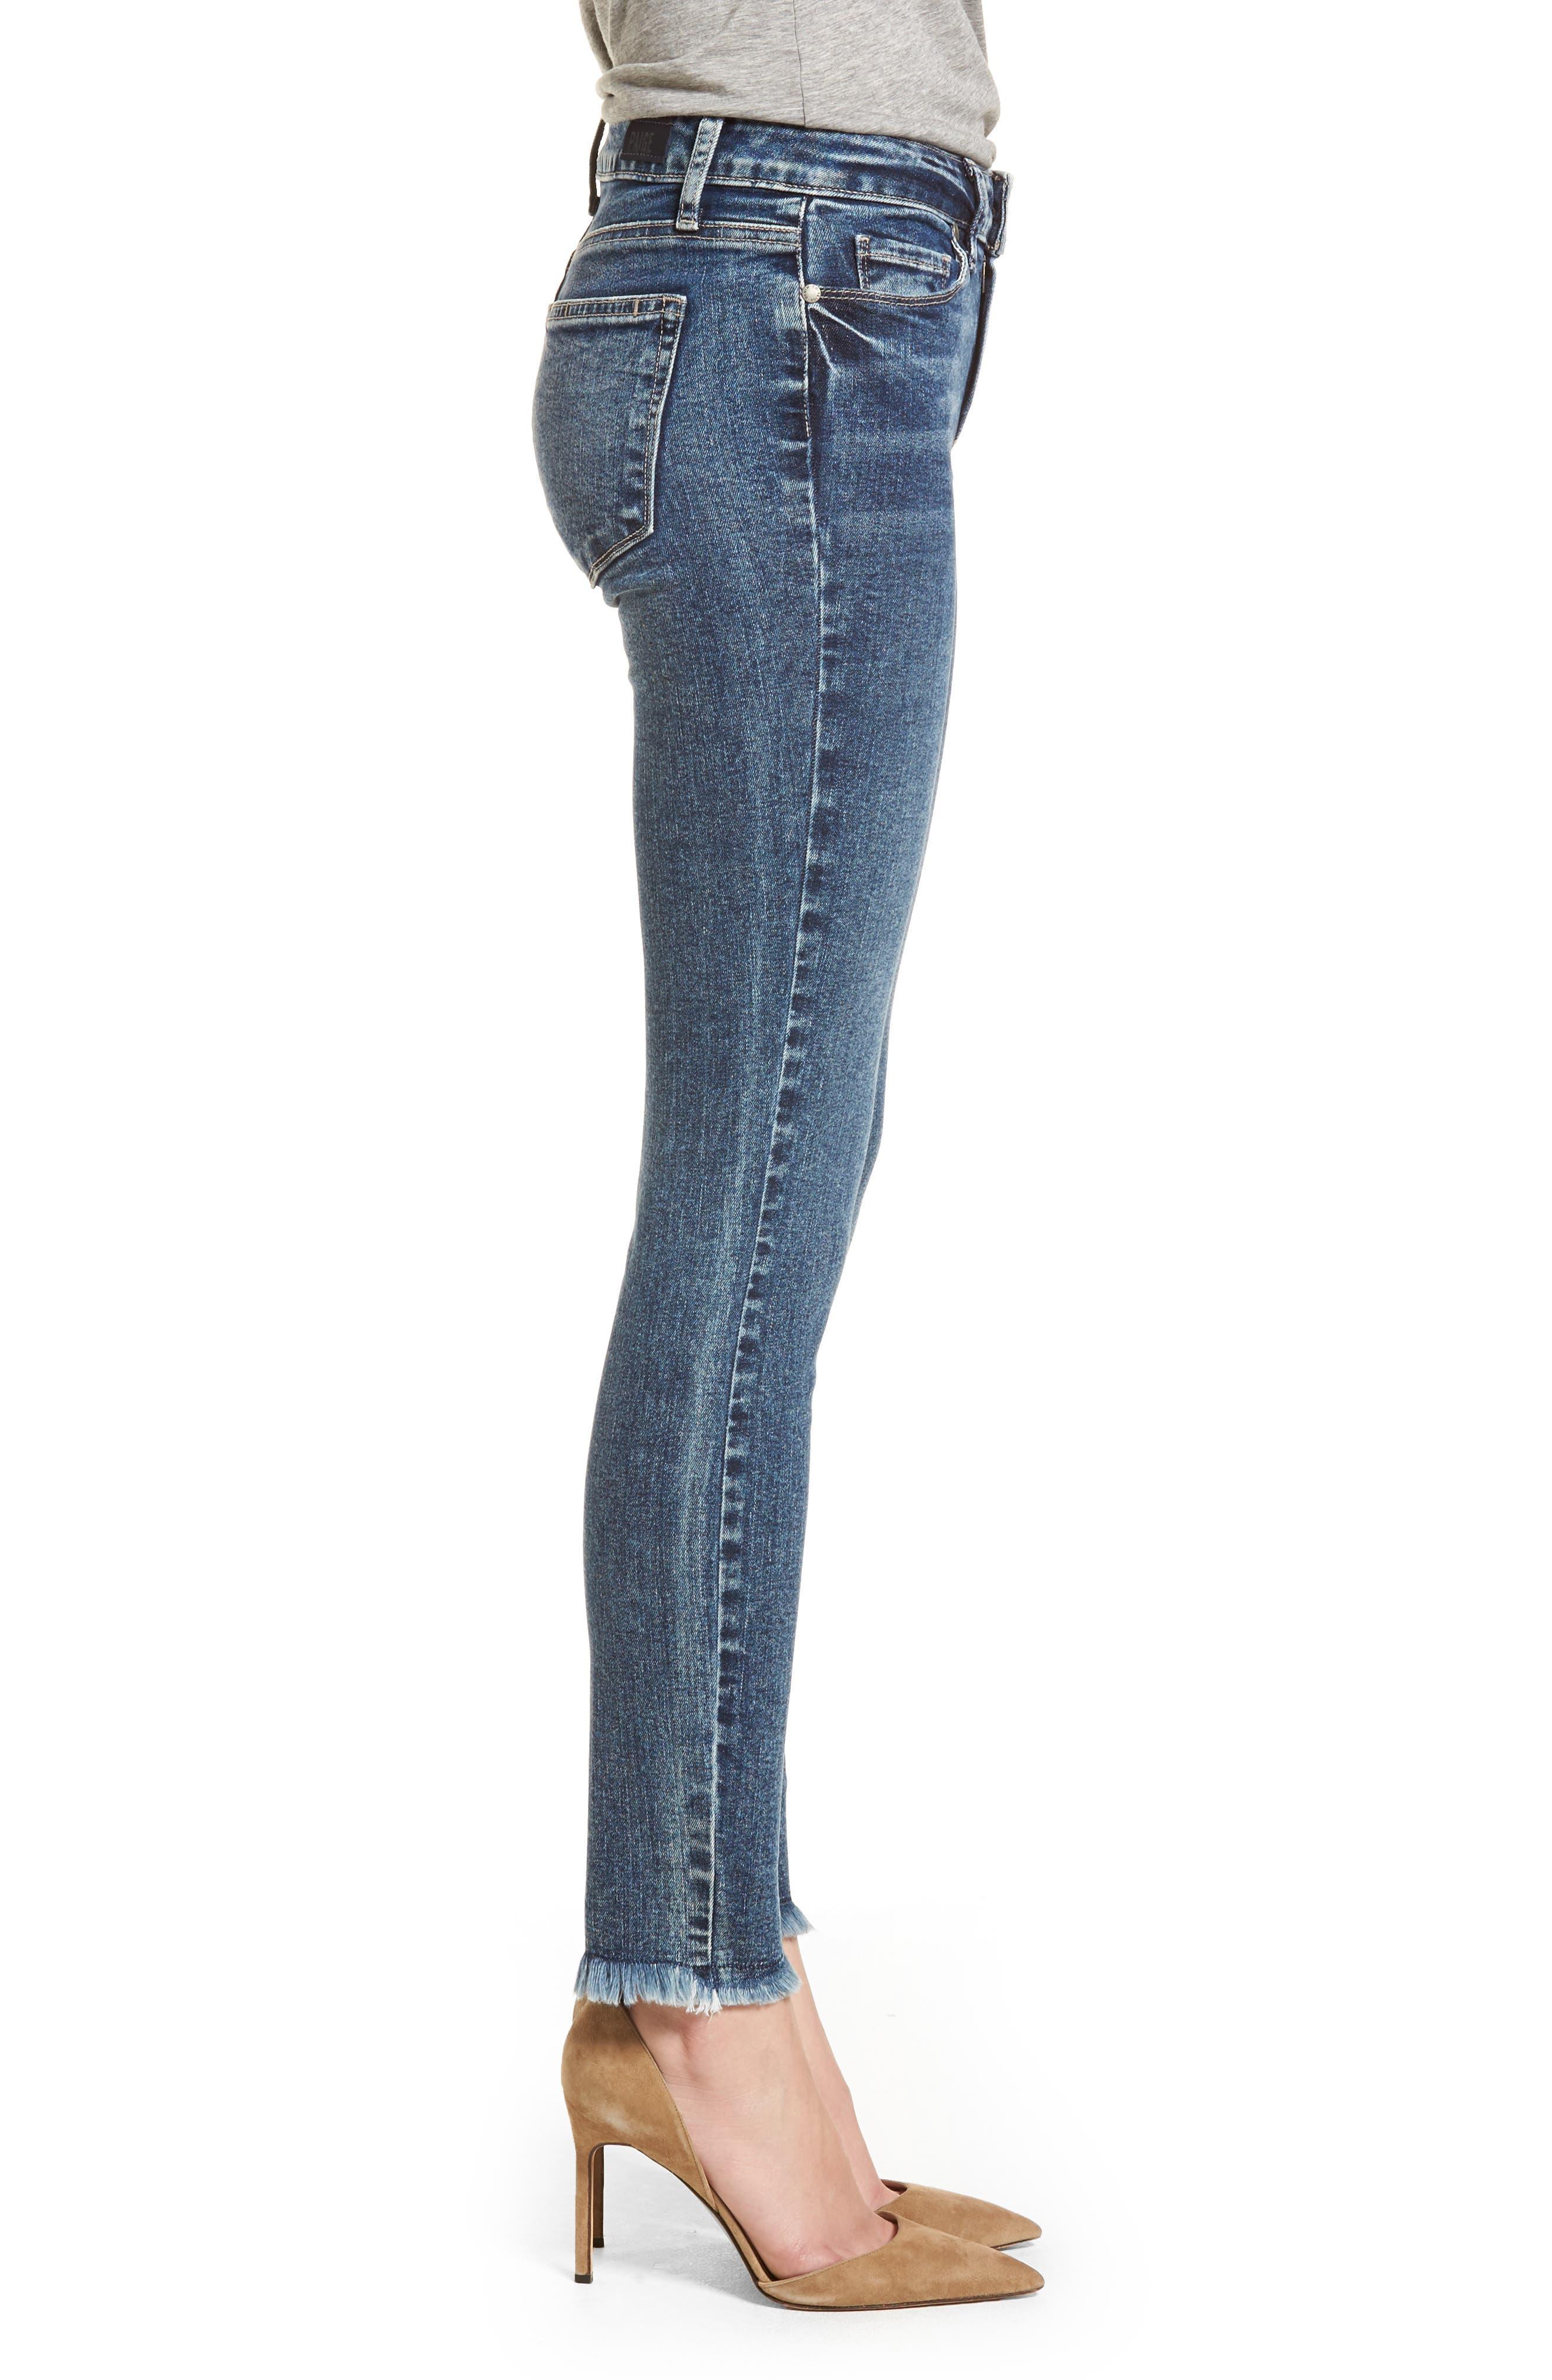 Transcend Vintage - Verdugo Ultra Skinny Jeans,                             Alternate thumbnail 3, color,                             Iness